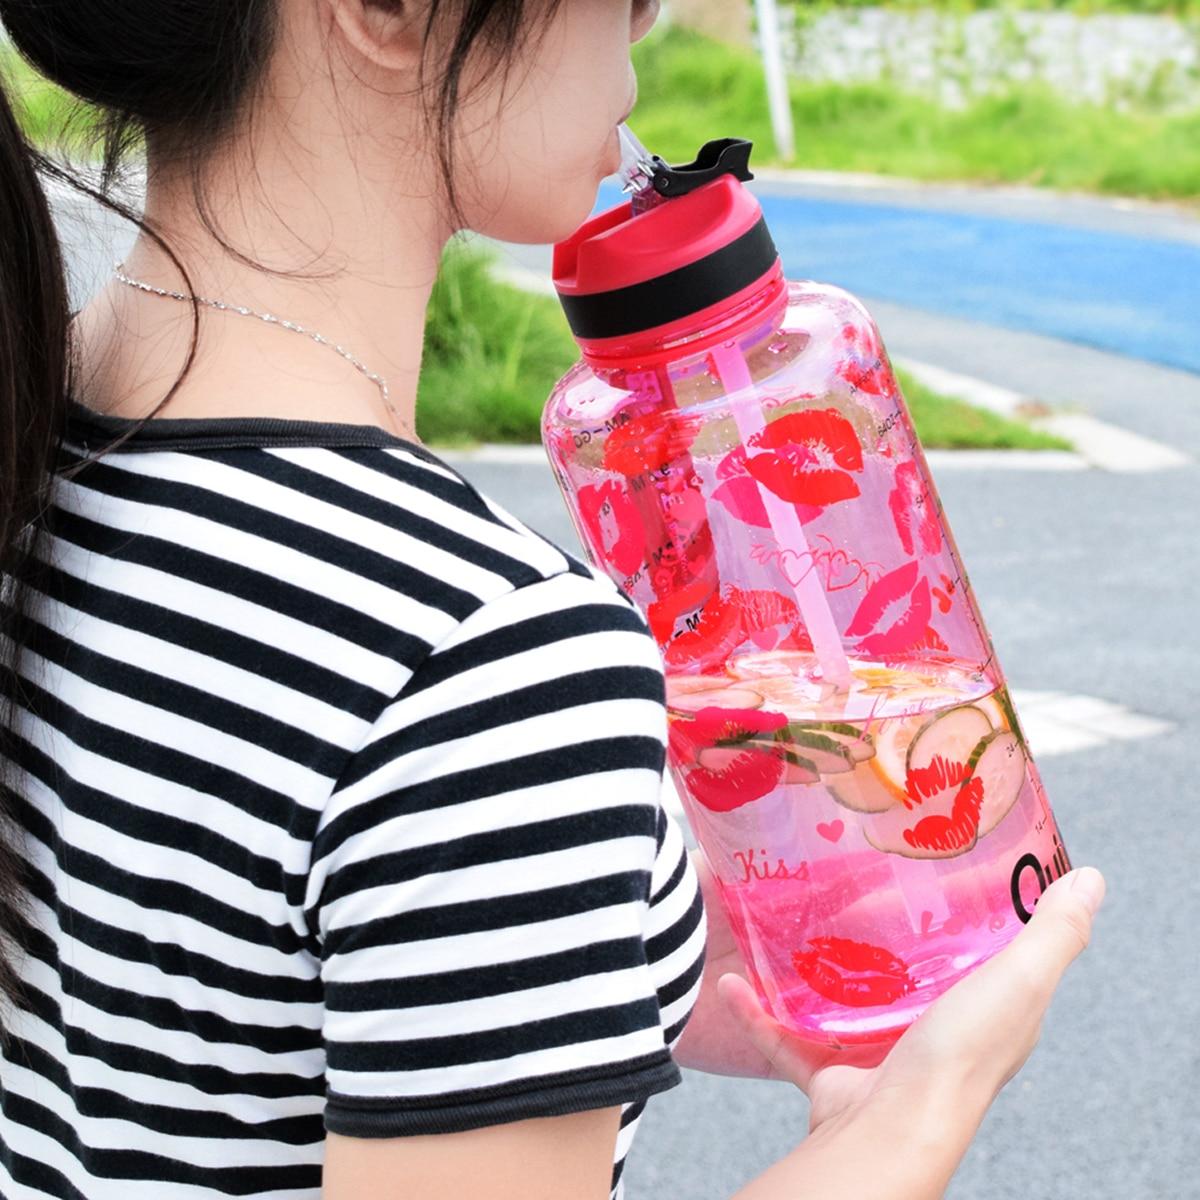 QuiFit 2L 1 3L 450ml Half Gallon Tritan Water Bottle With Straw BPA Free My Drink